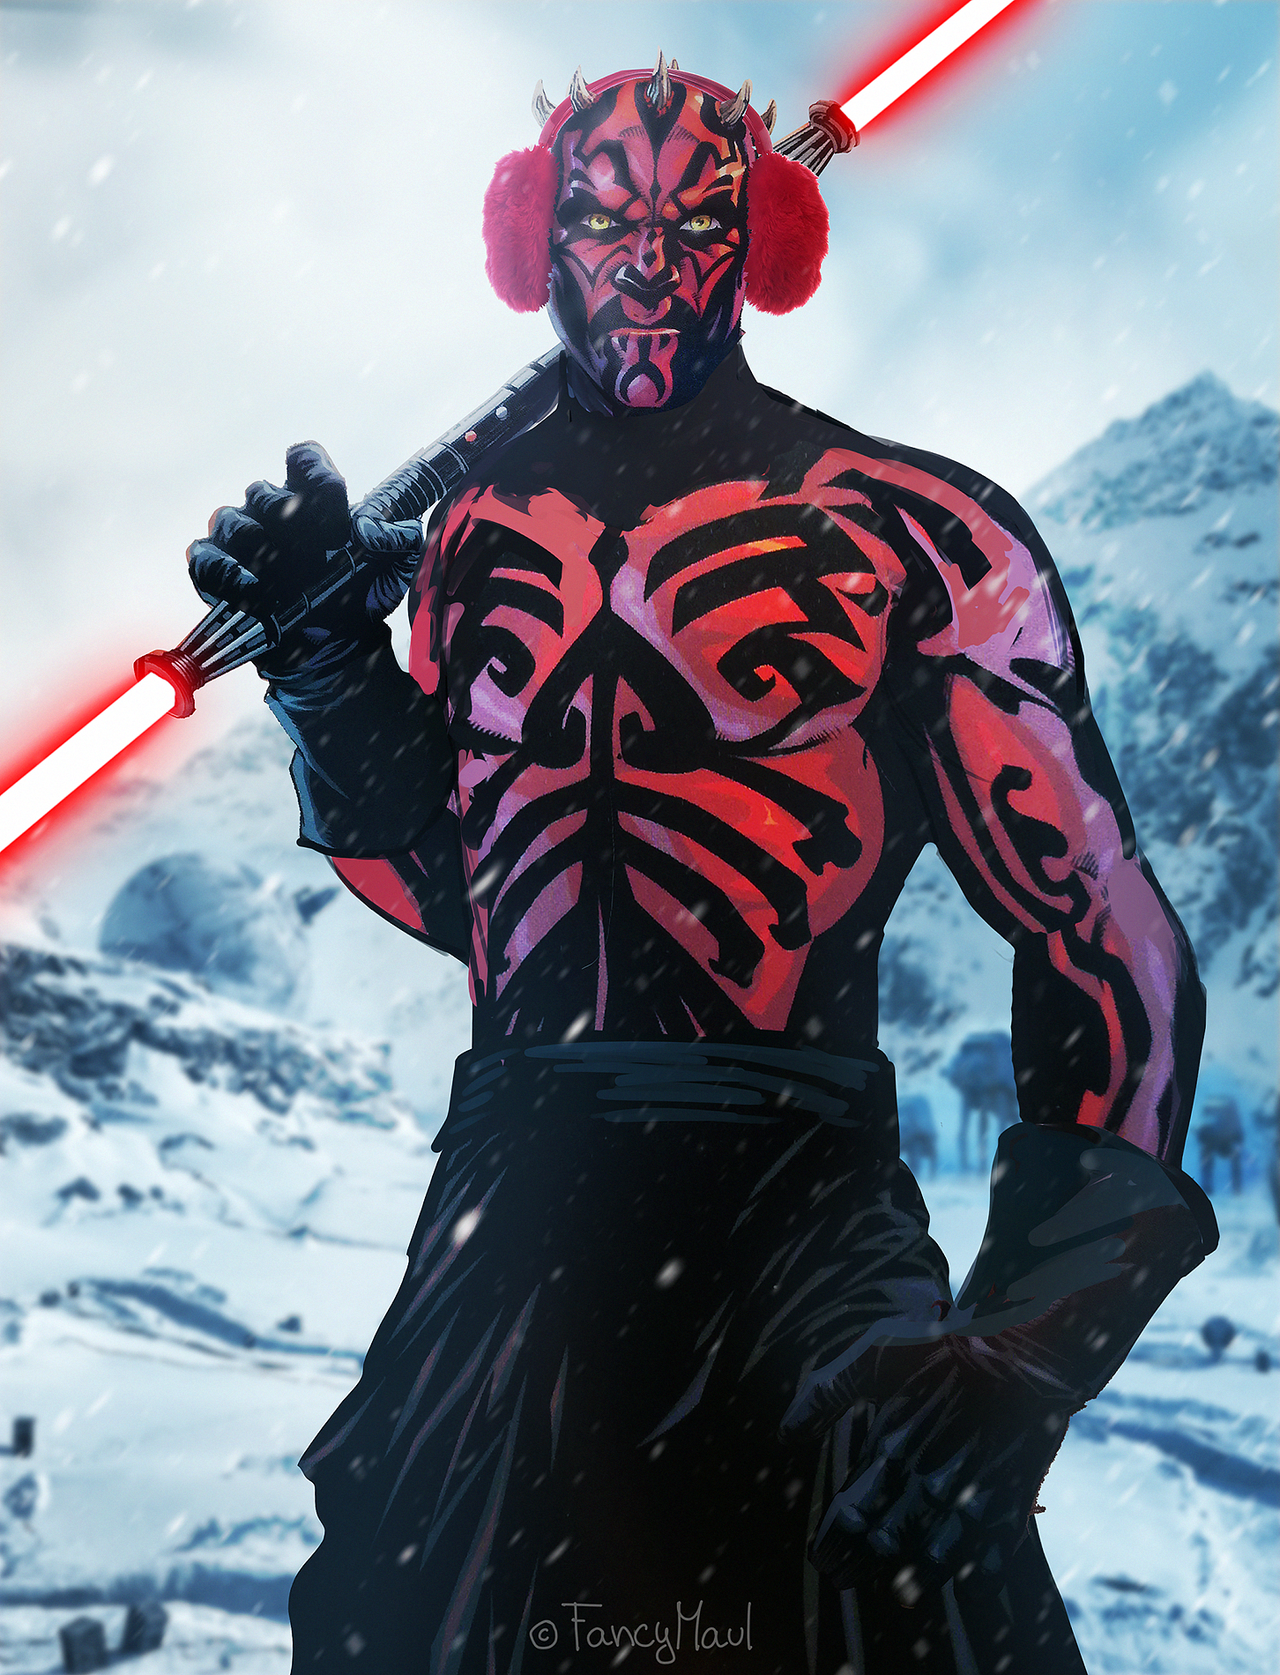 I Present You Darth Maul S Hoth Skin In Battlefront 2 Darth Maul Jedi Art Star Wars